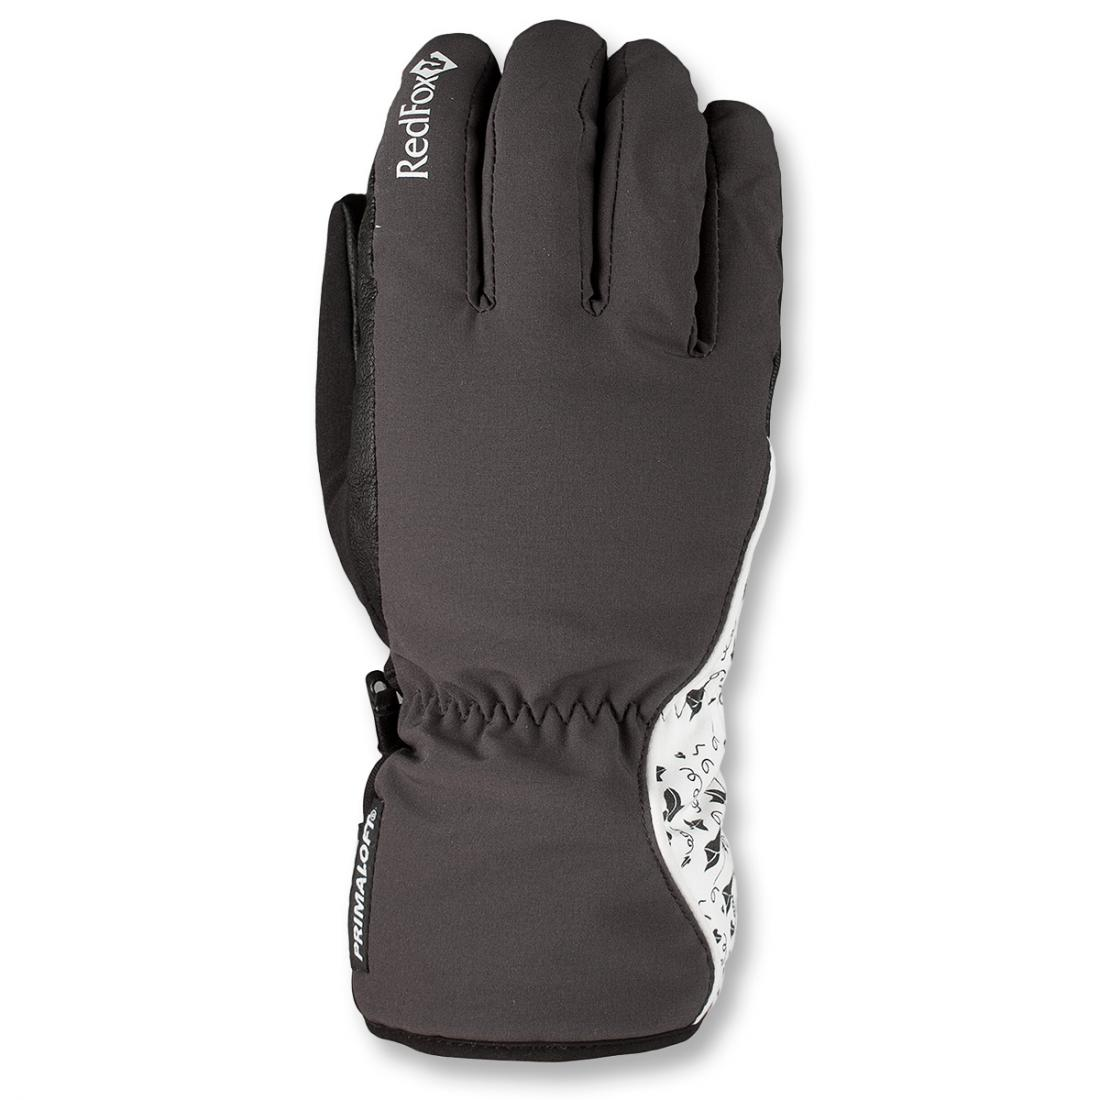 Перчатки женские RozaryПерчатки<br><br><br>Цвет: Белый<br>Размер: XL